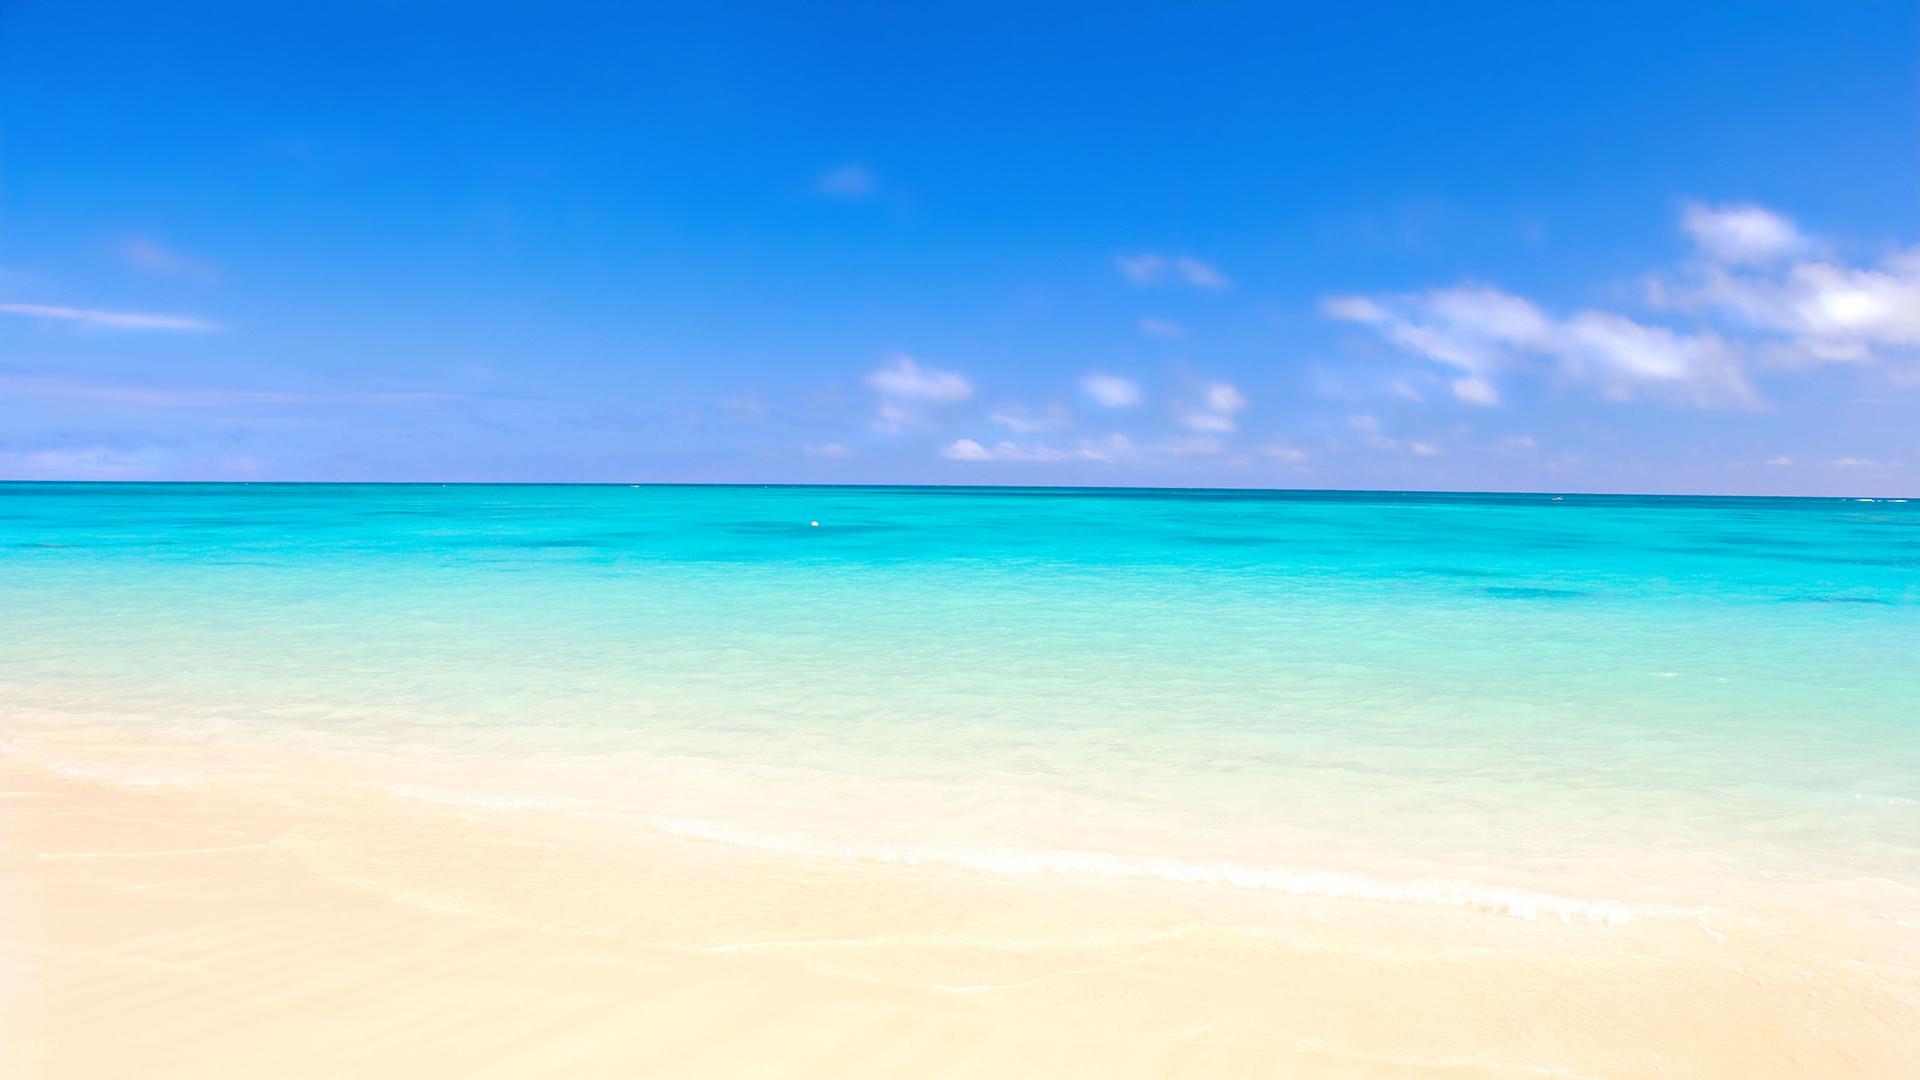 ocean sand beach